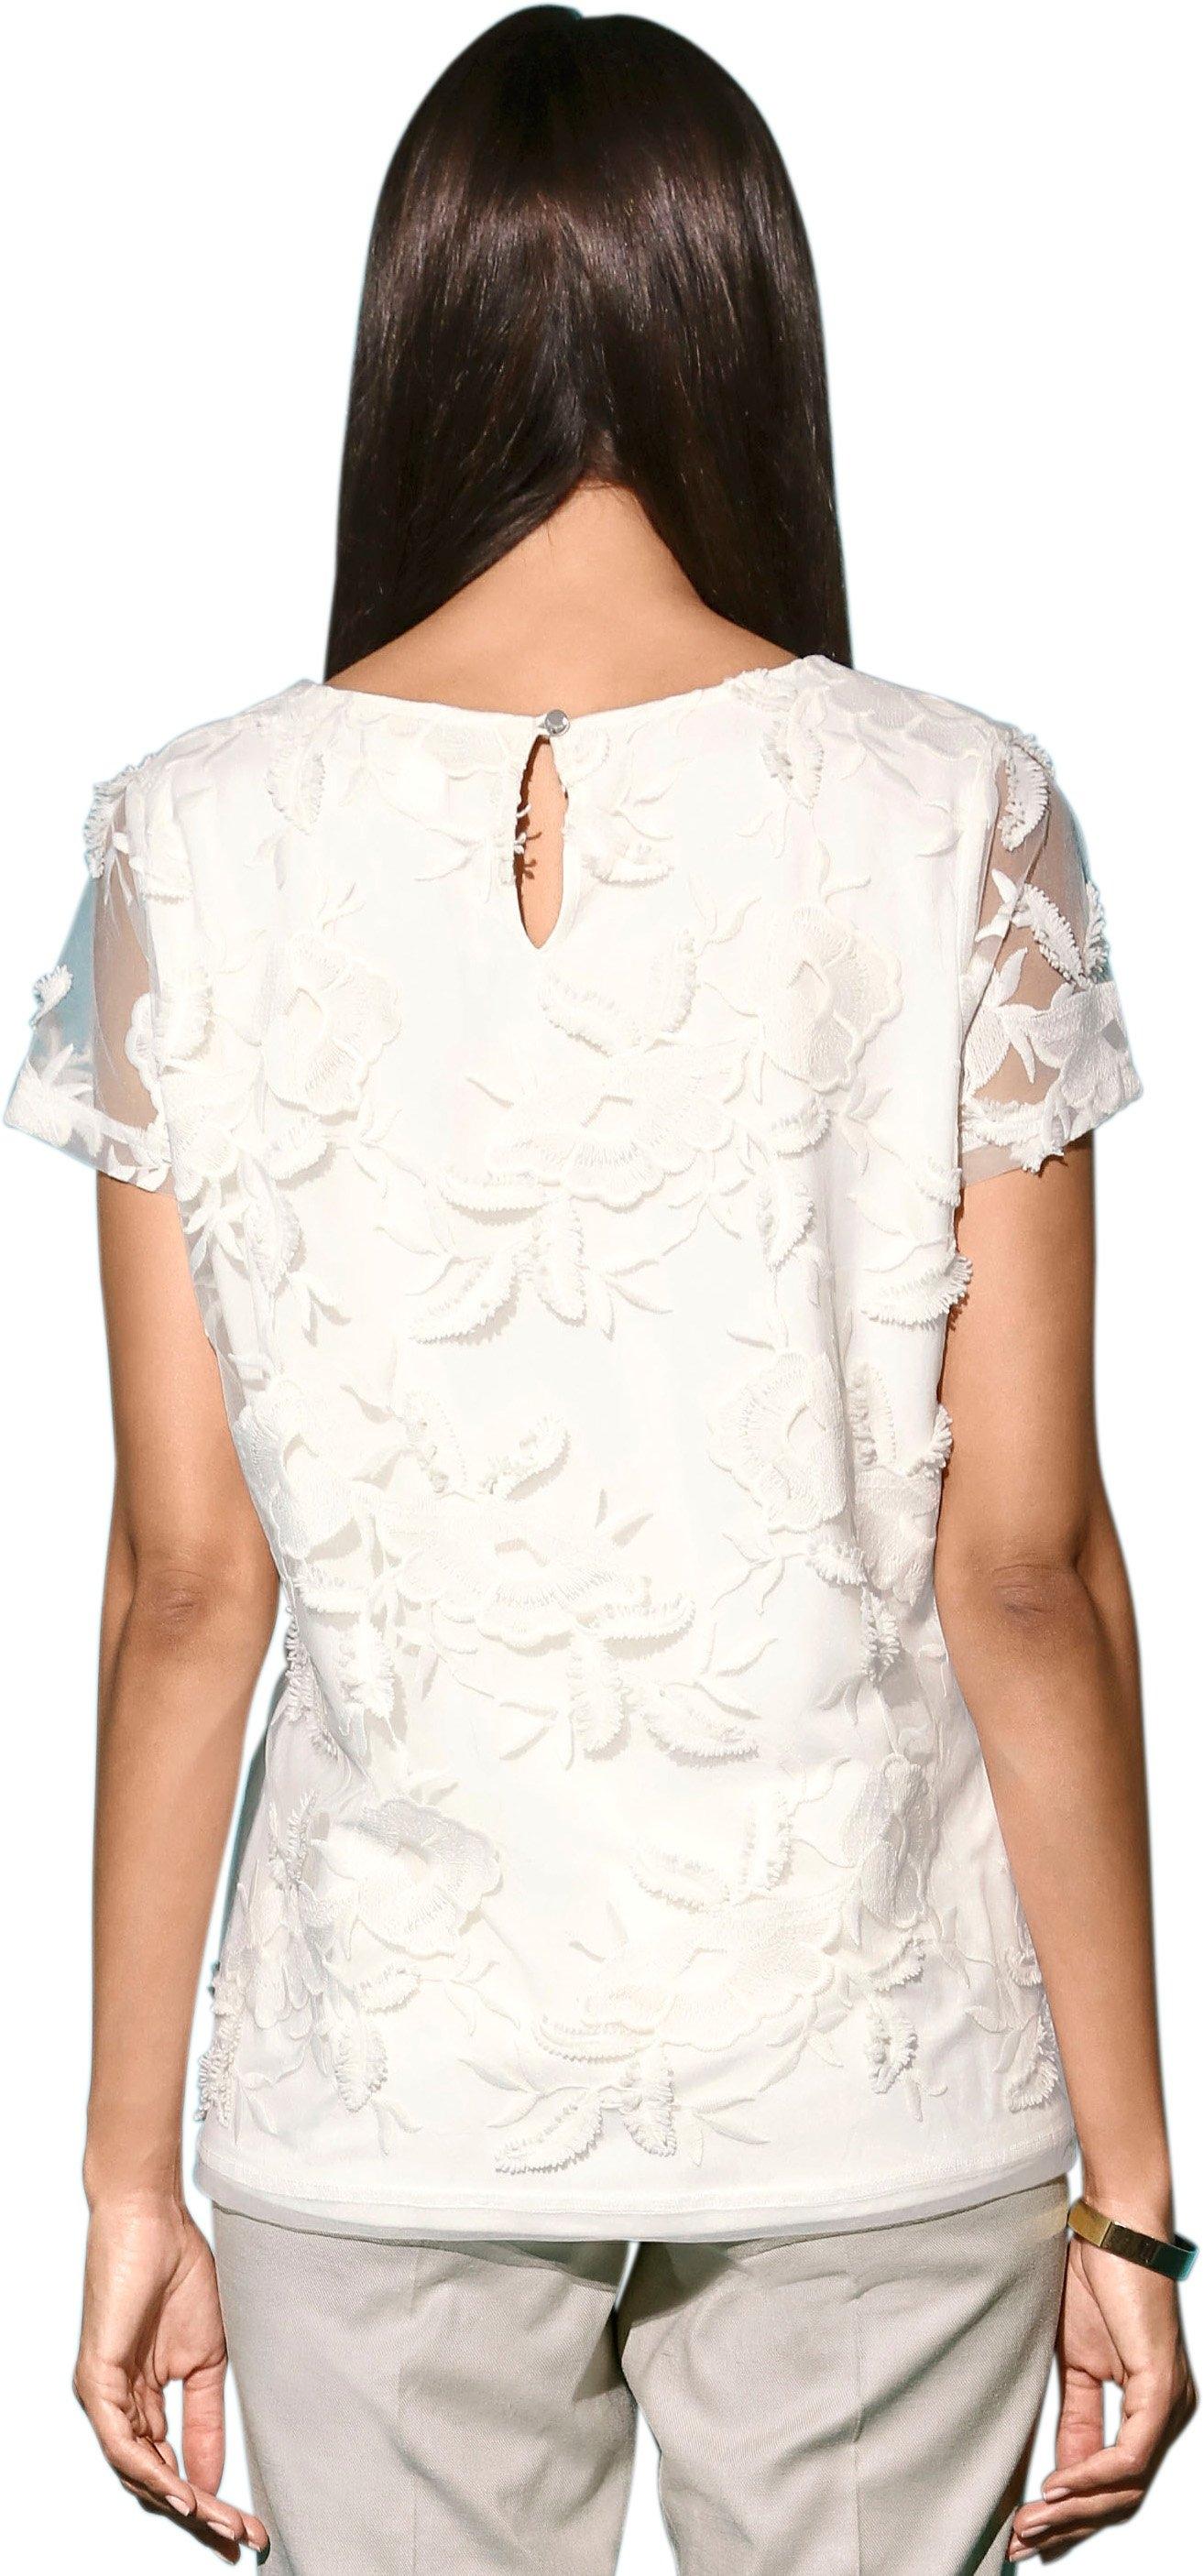 Bestellen Nu L Kant Création Shirt Met look Online Luxueuze CxoedB